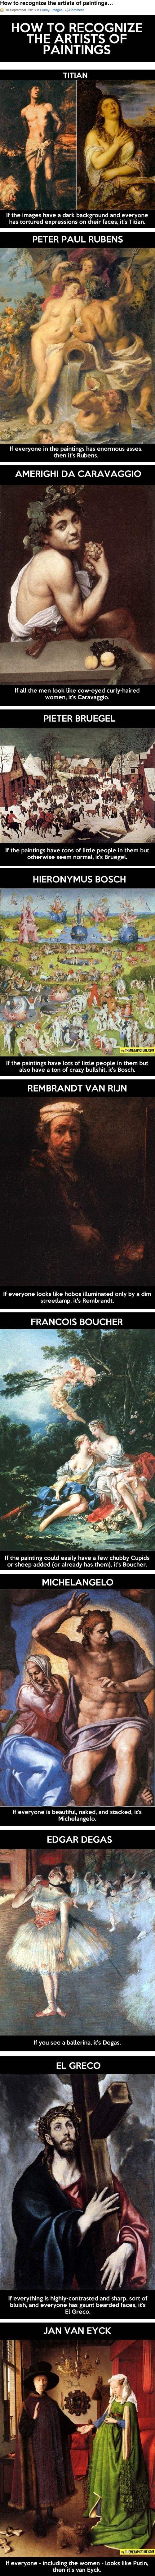 A little Art History Lesson